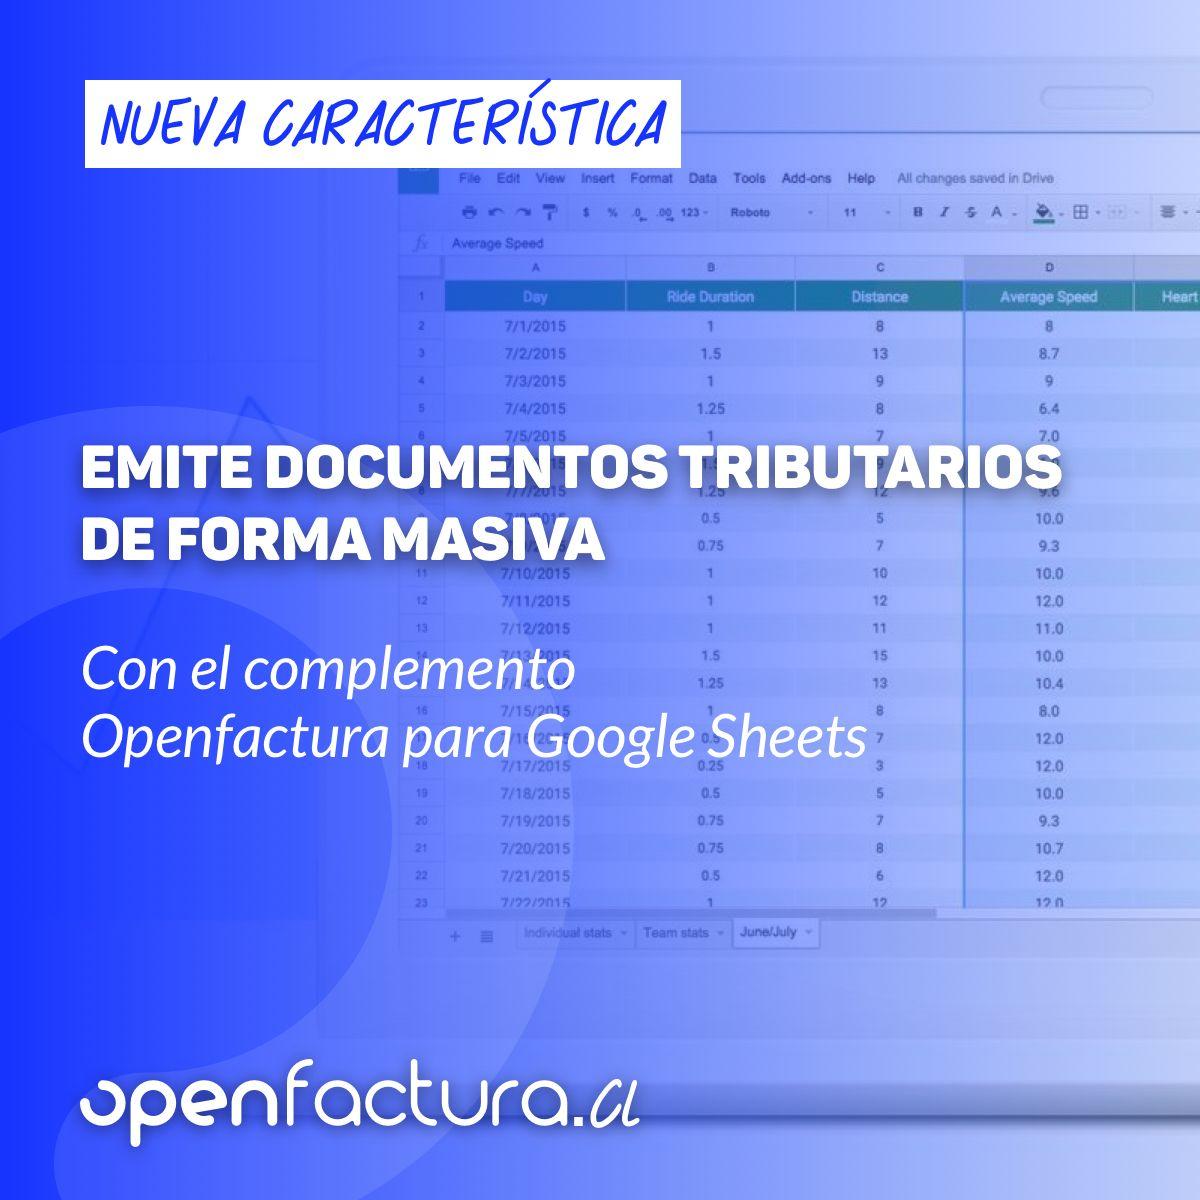 Complemento Openfactura para Google Sheets ya disponible